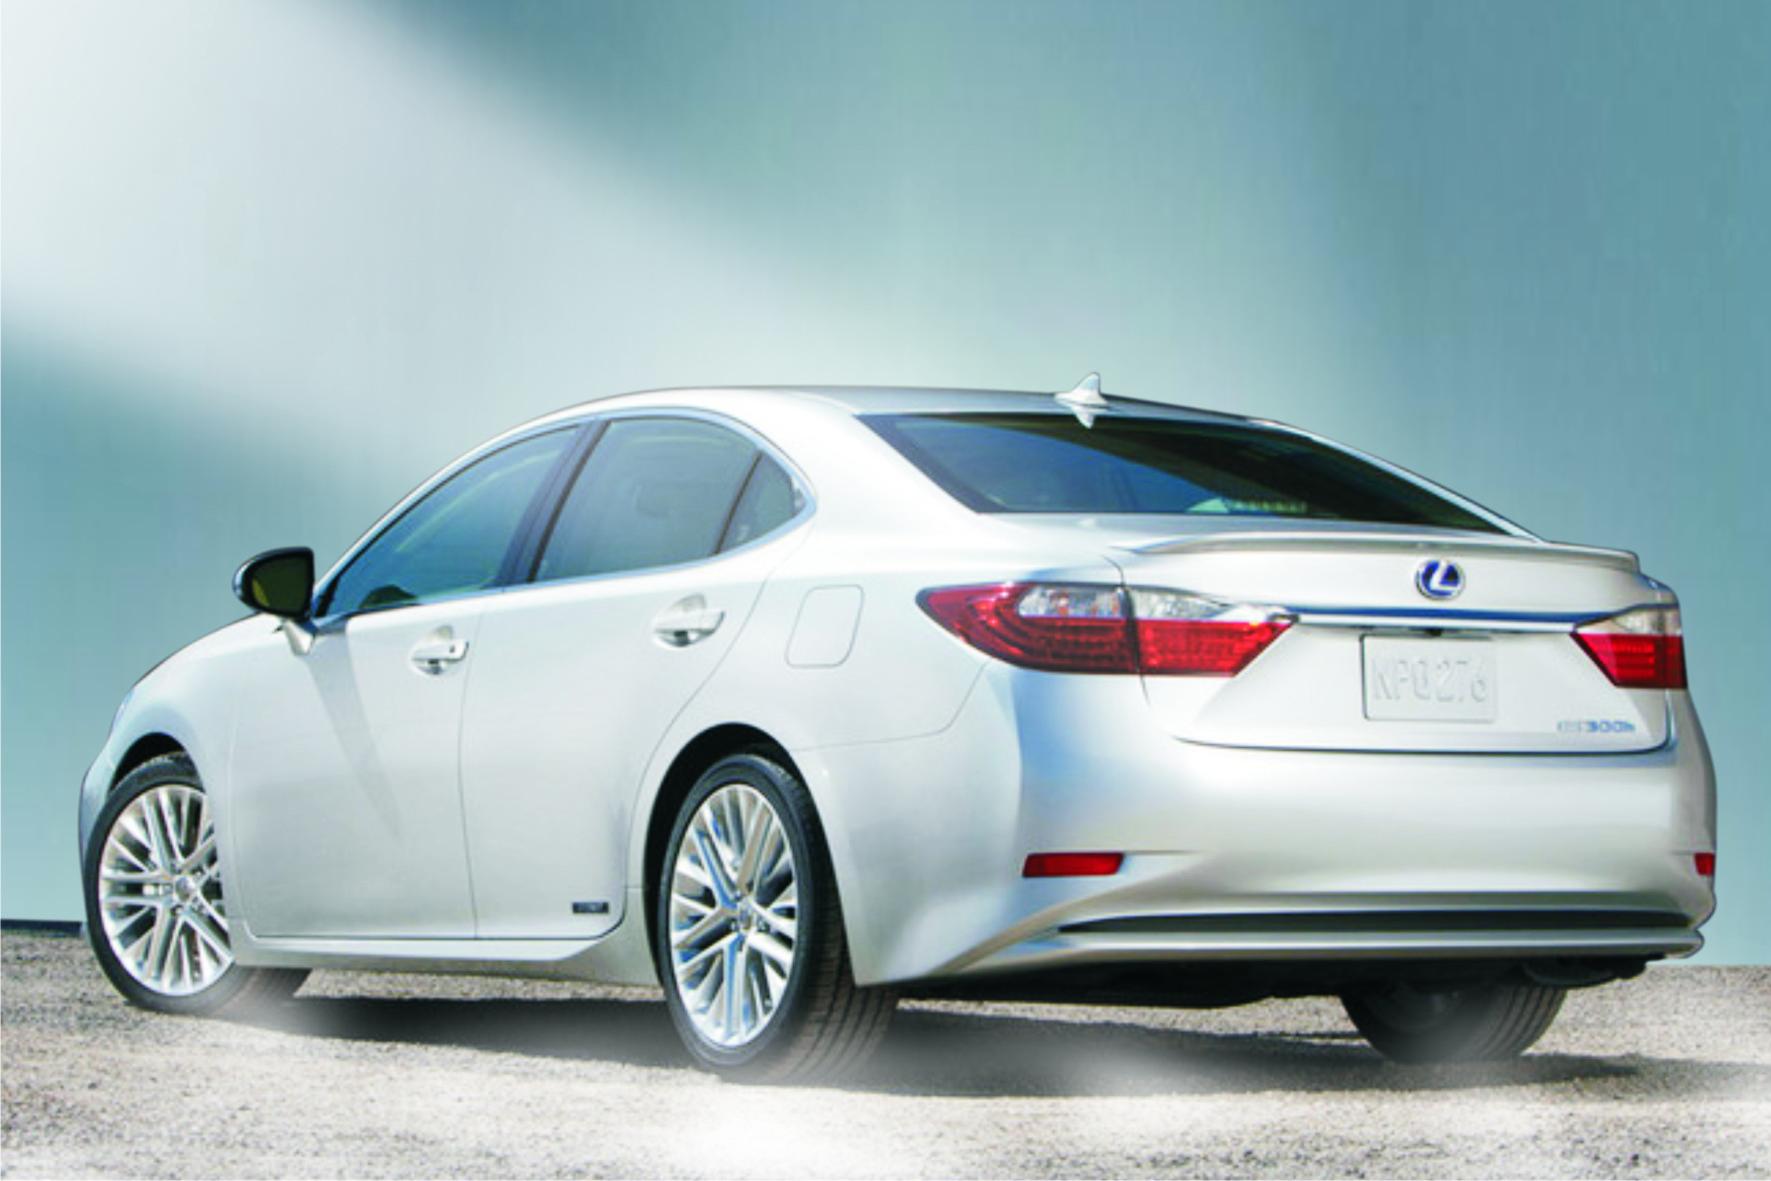 Lexus ES 350 Rear free online image editor Wallpaper